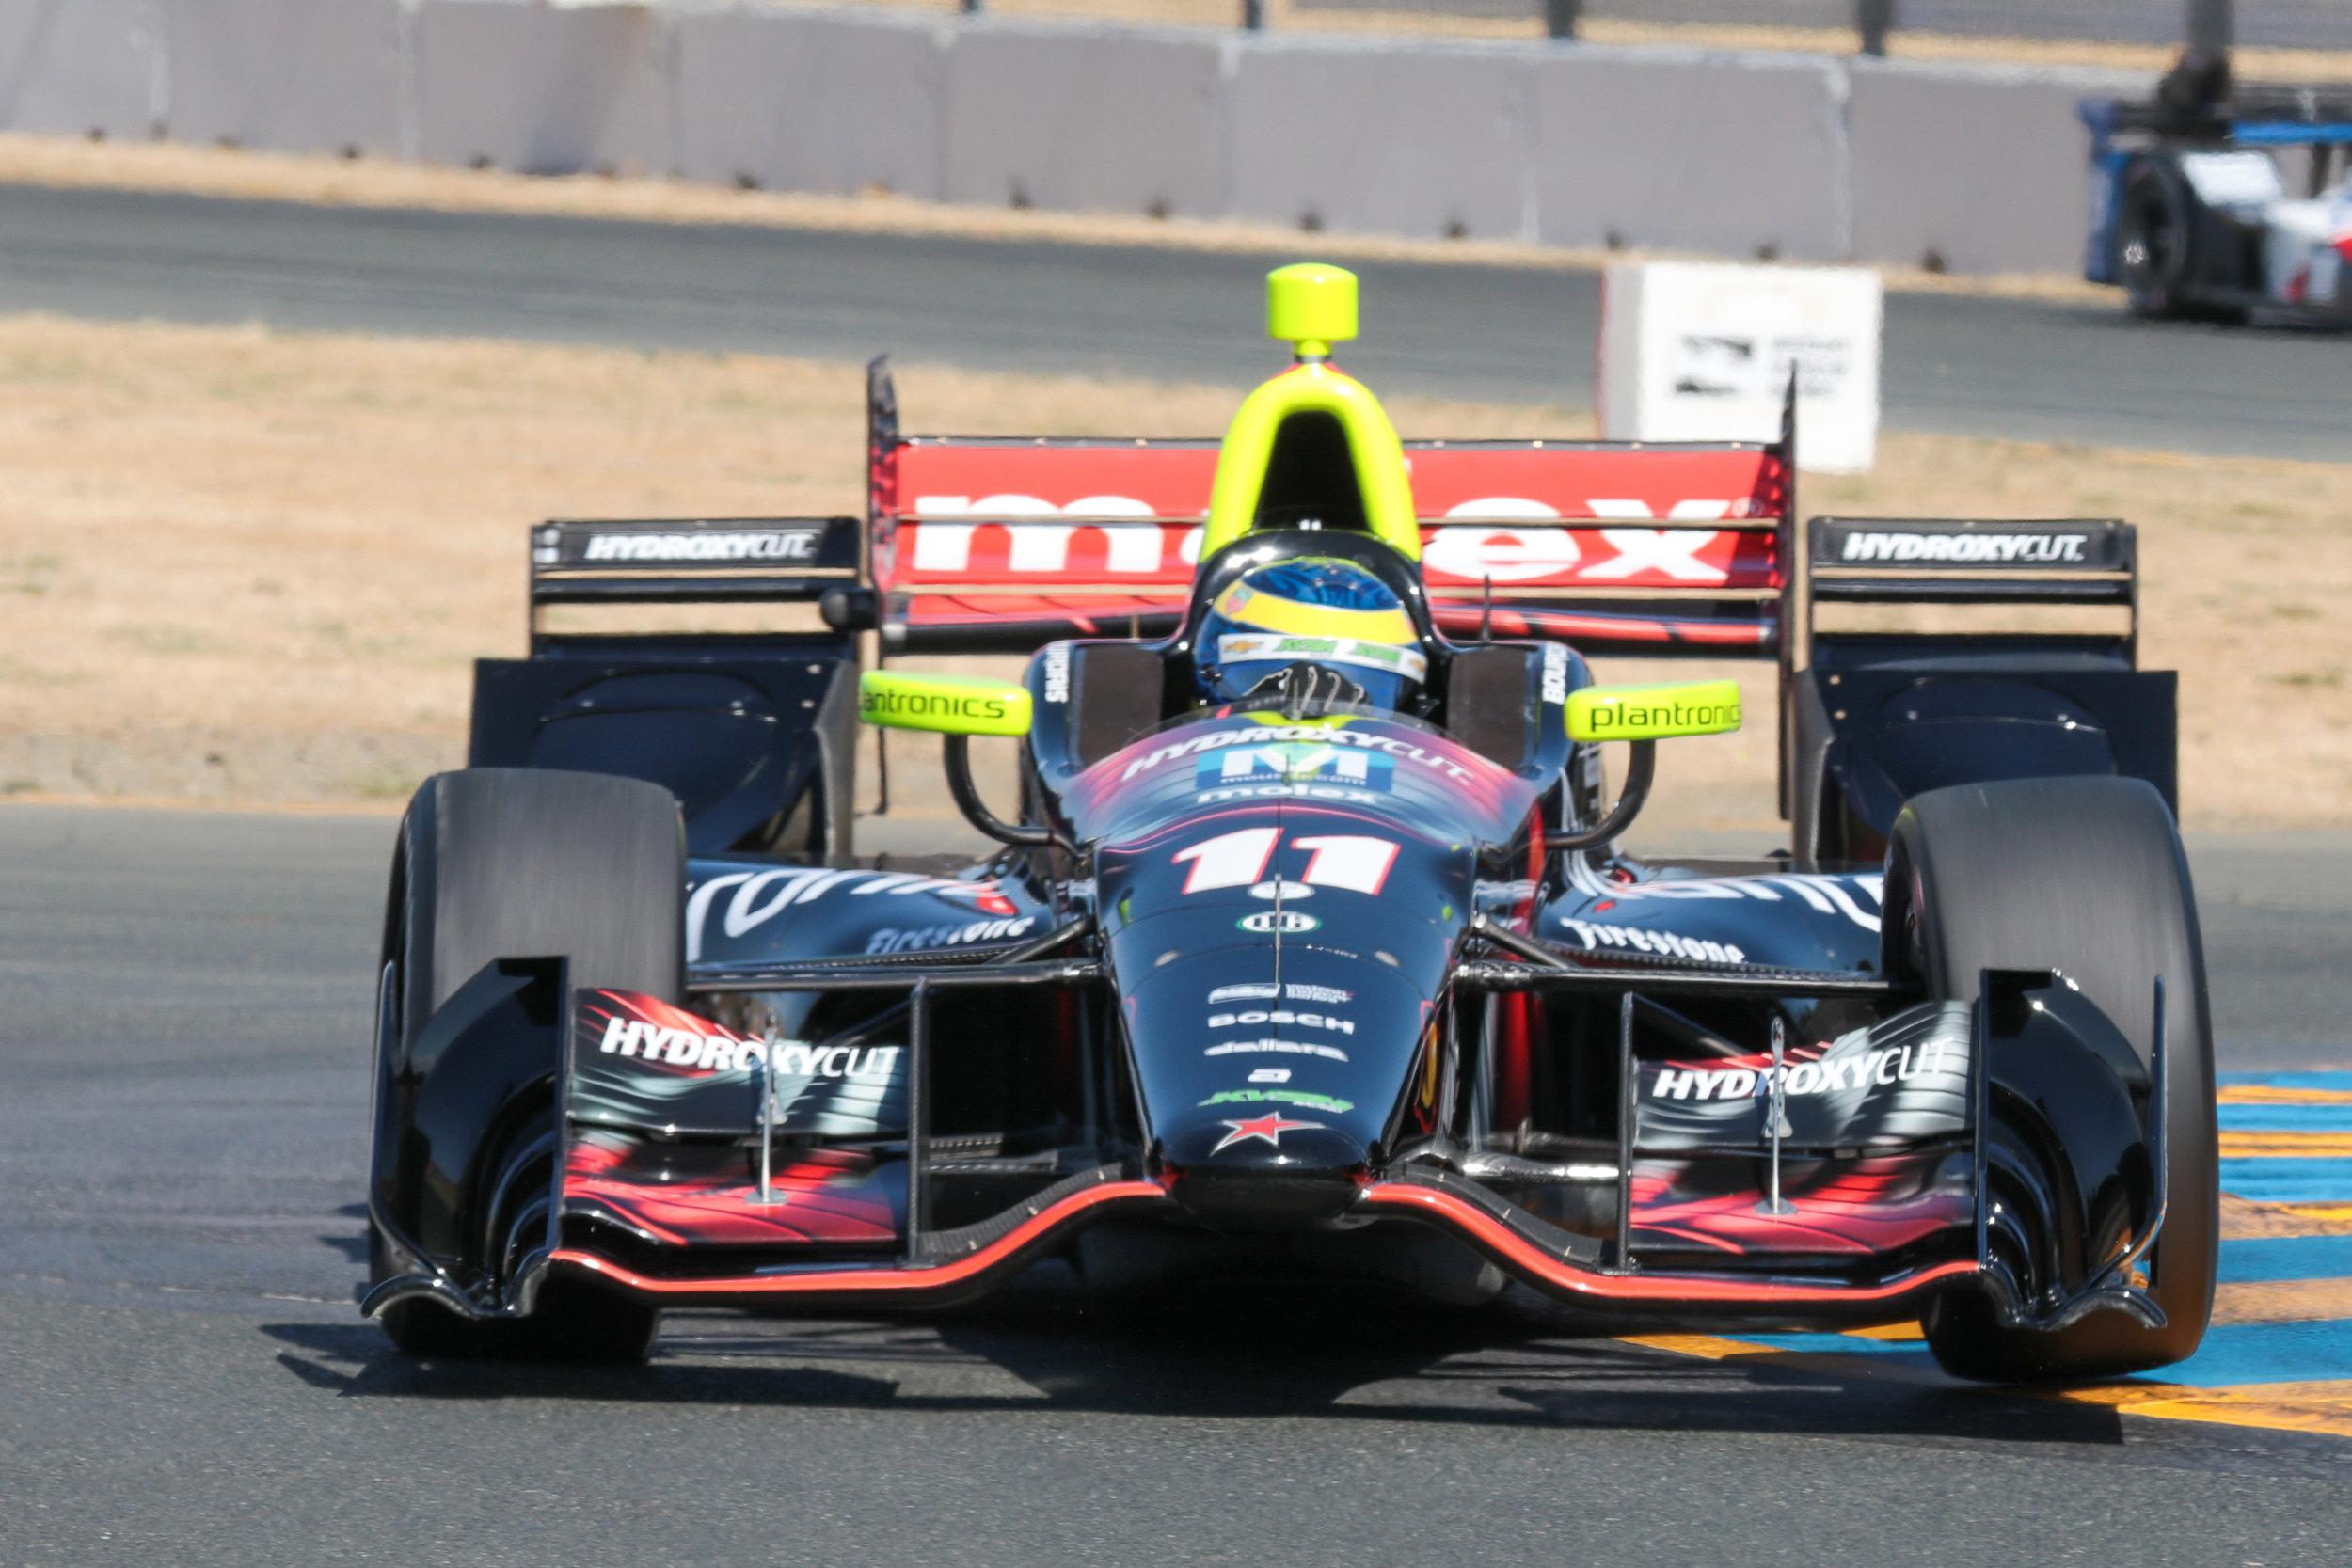 Indy16-2013.jpg